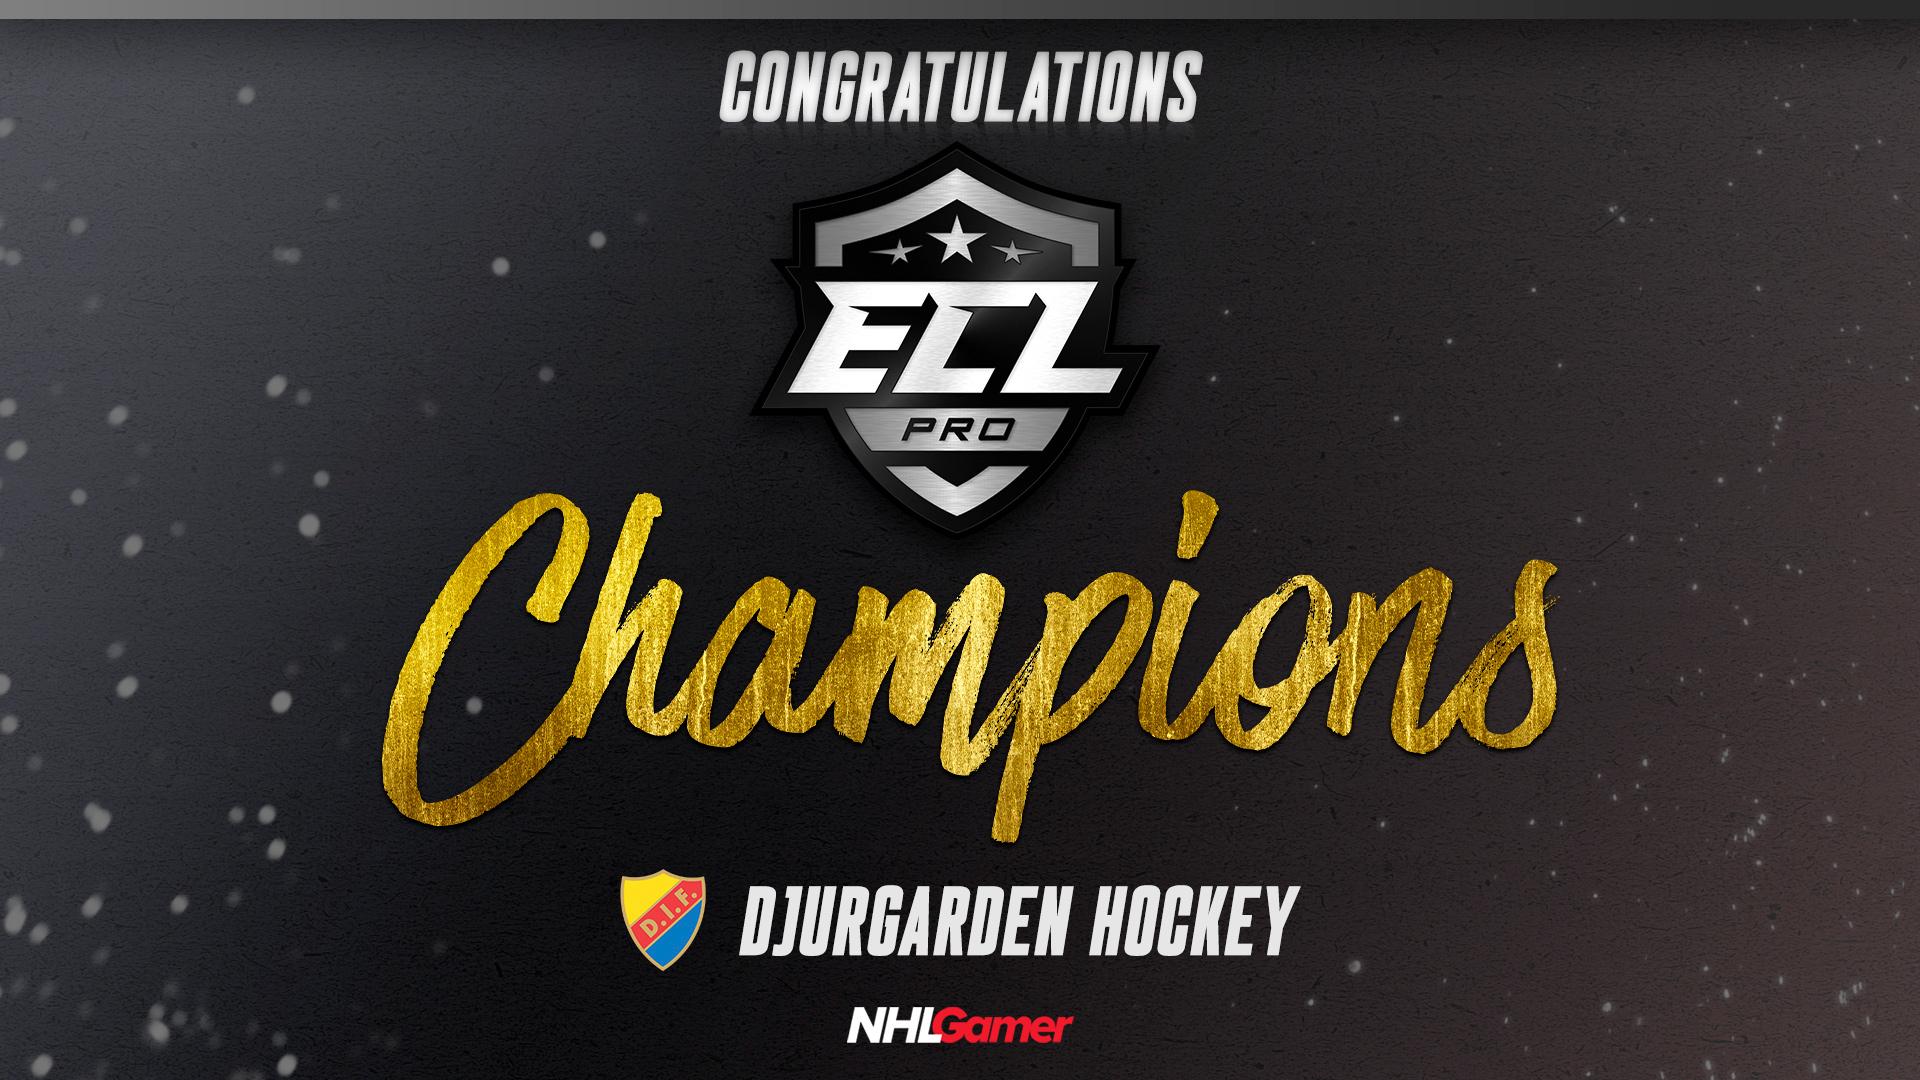 ECL_12_Pro_Champions_Djurgarden.jpg